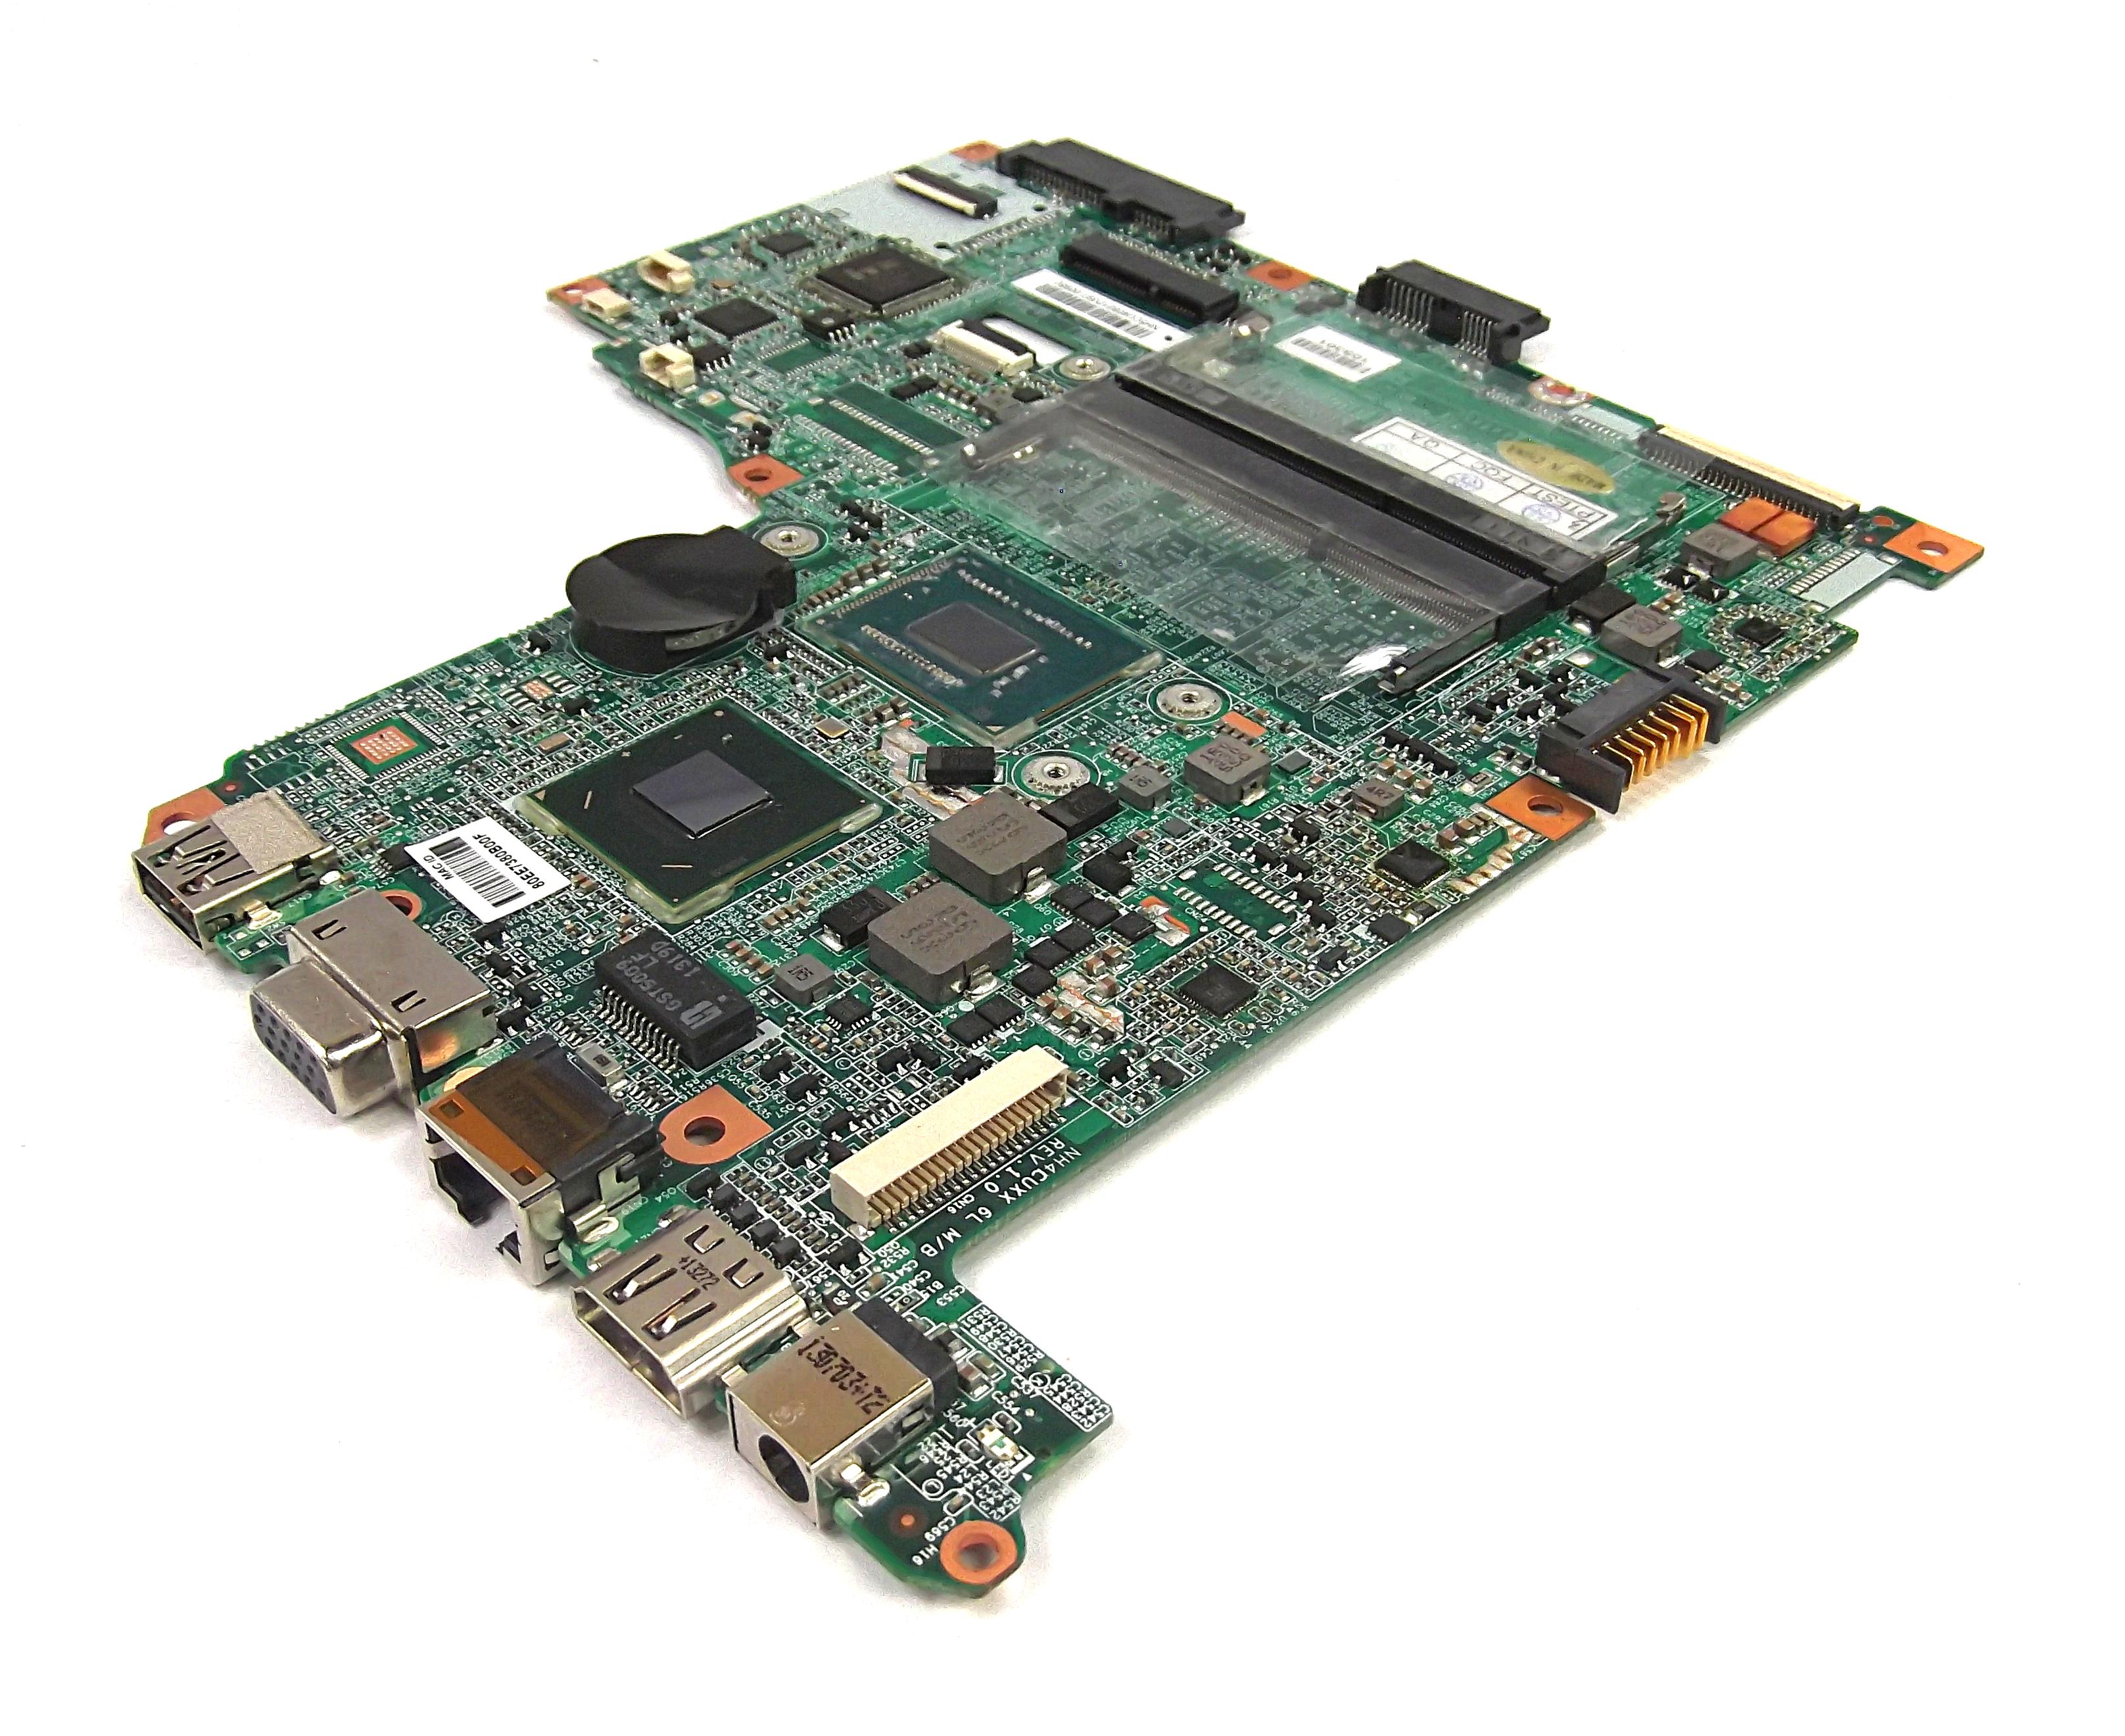 Advent NH5CU00001D39T Laptop Motherboard with BGA Intel SR0VQ CPU - E326167 TC-1